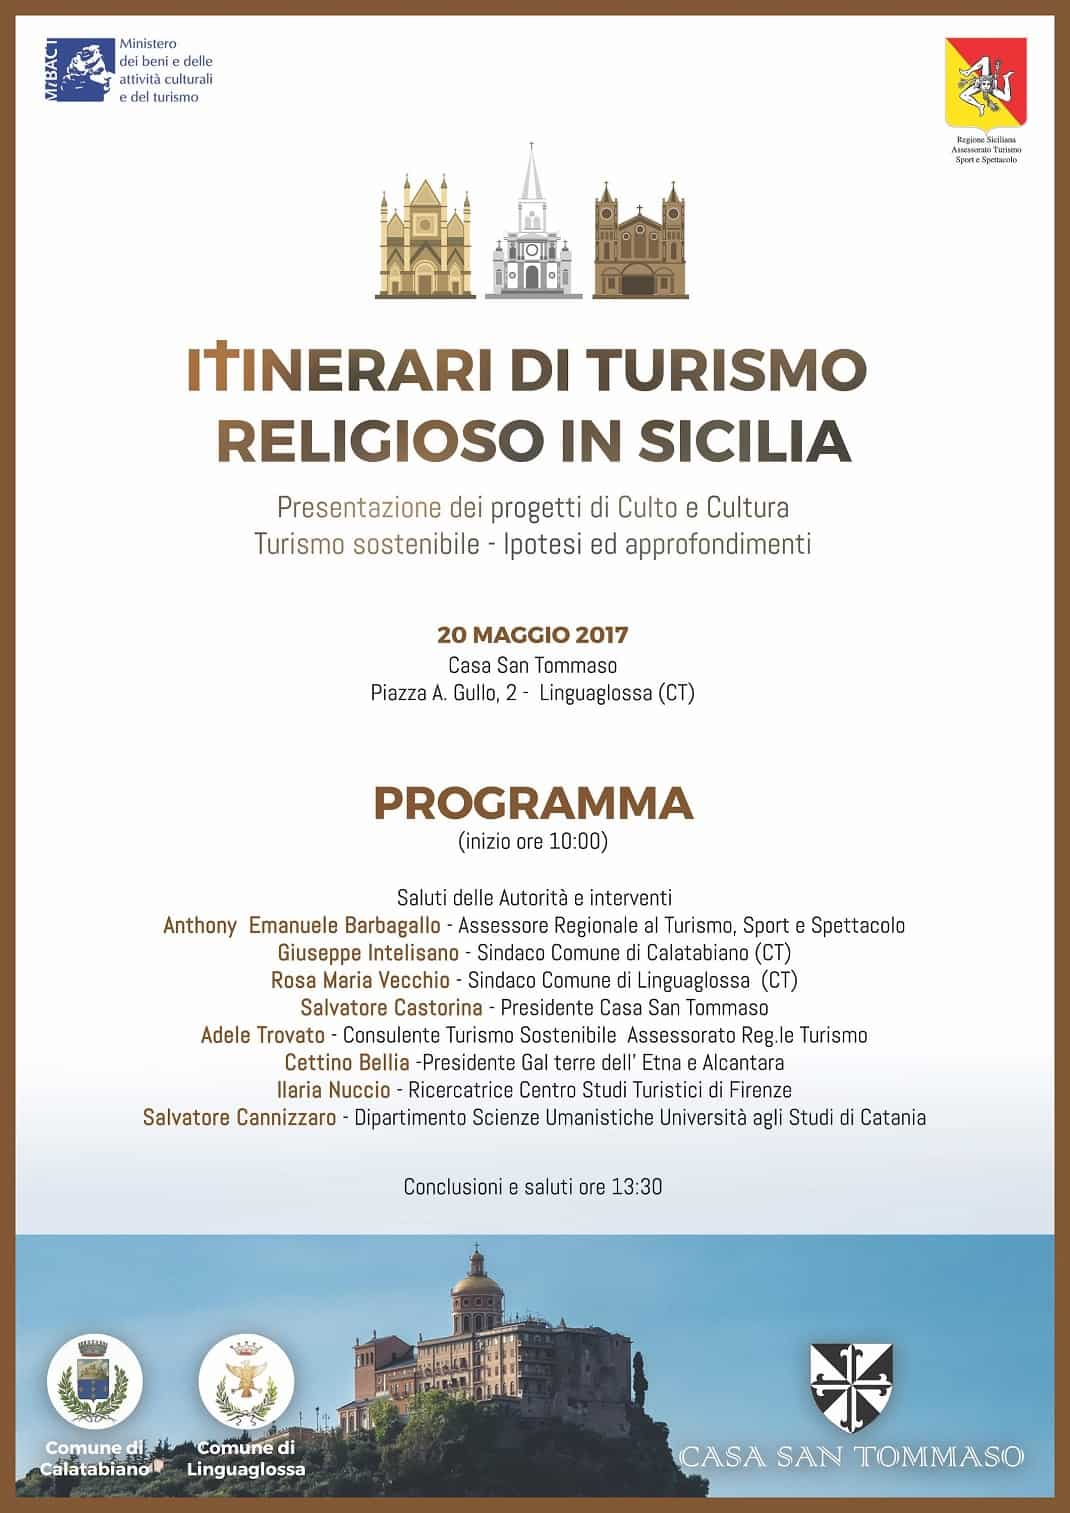 ITINERARI TURISMO RELIGIOSO